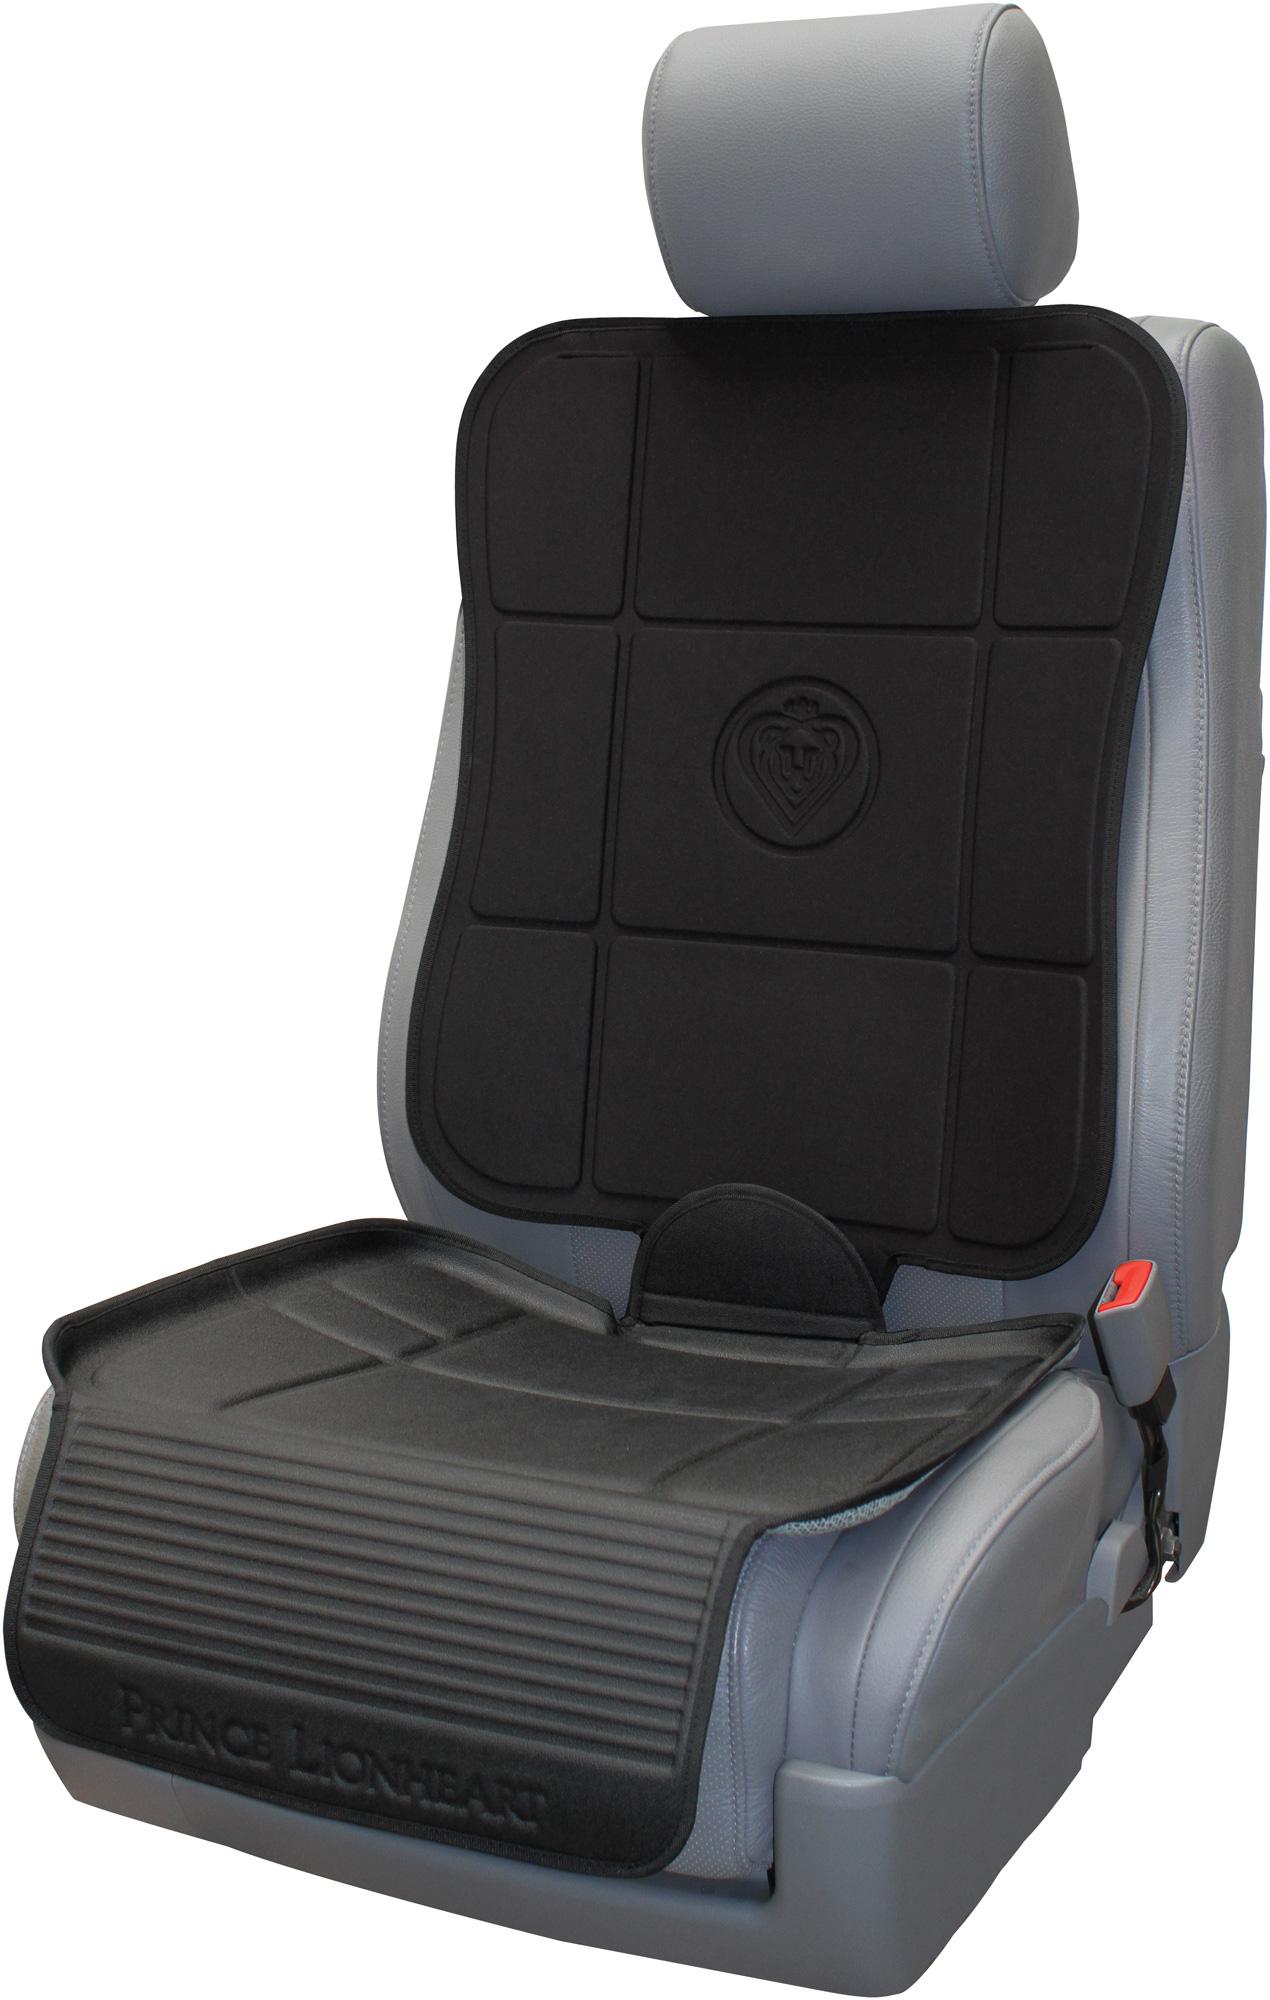 prince lionheart protections de siege auto isofix compatible voiture n ebay. Black Bedroom Furniture Sets. Home Design Ideas